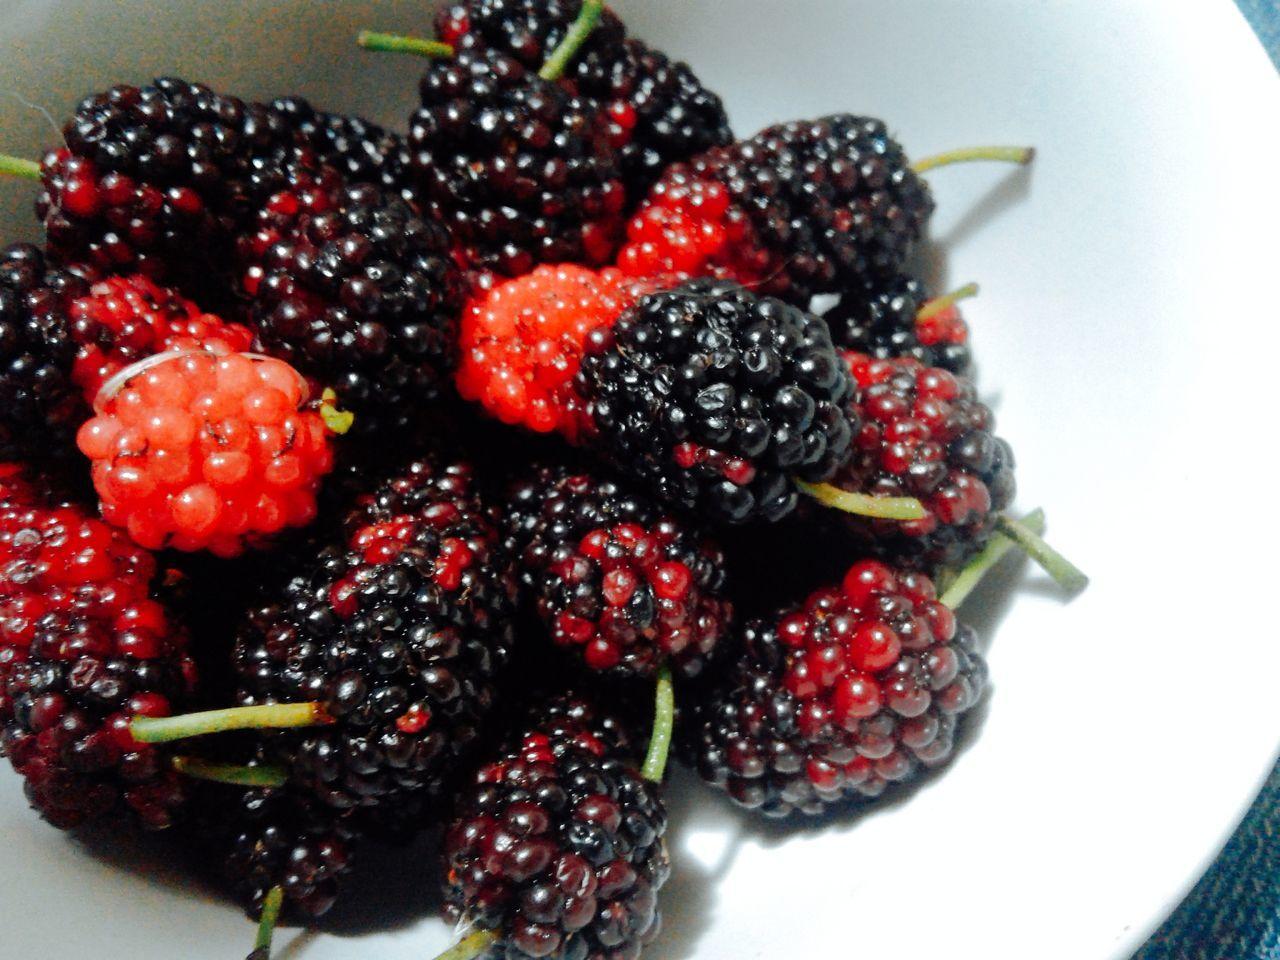 Cherry Cherry Tree Cherrys Strawberries Cherryred Red And Black Taste Tasty😋 Taste Good Taste Of Summer  Sweet♡ Sweets Sweet Food Sweety  Relaxing Taking Photos Enjoying Life That's Me Hello World ♡♡♡♡♡